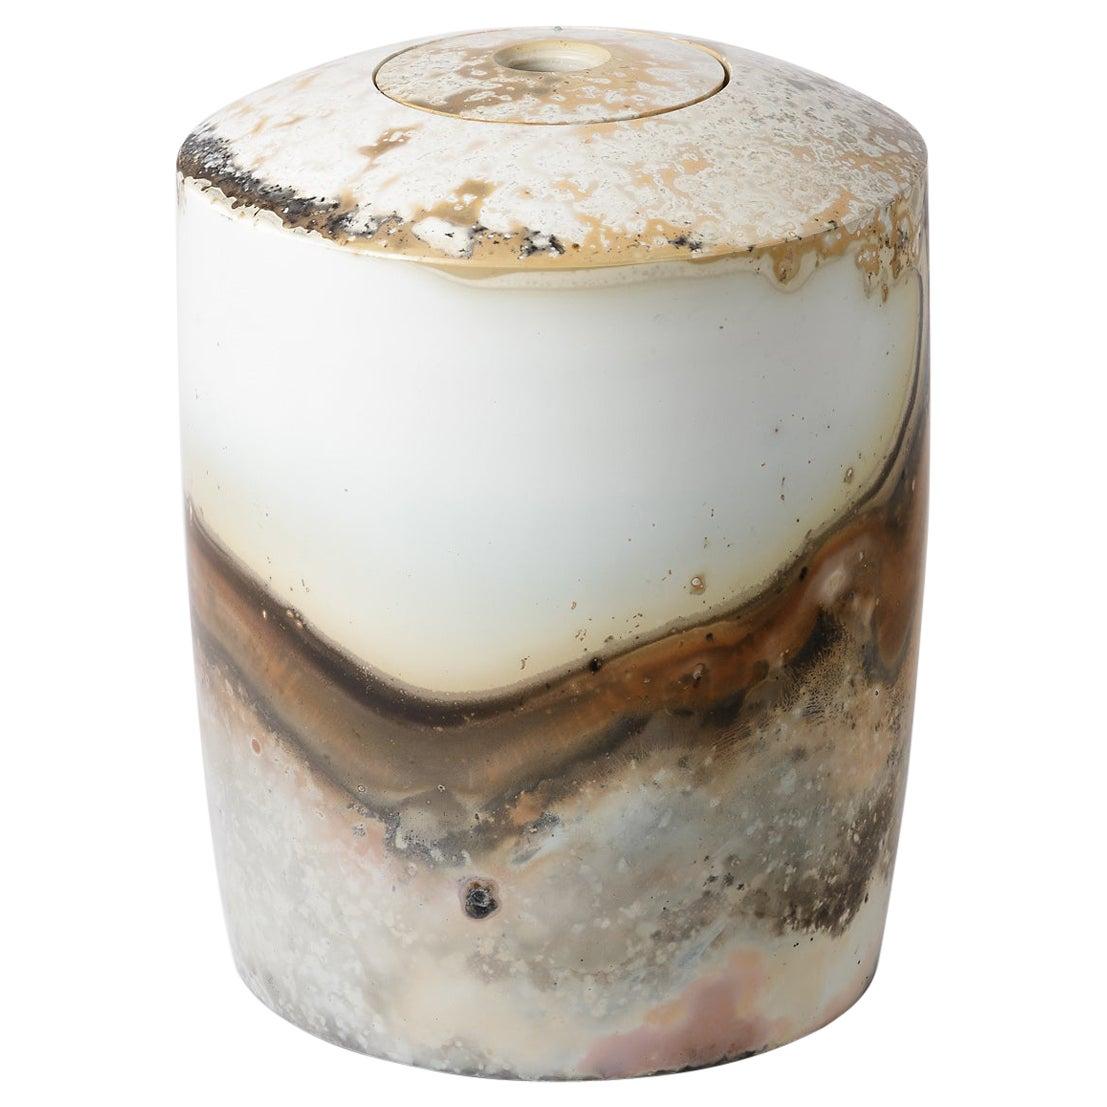 Ceramic Box by Alistair Dahnieux, circa 2011